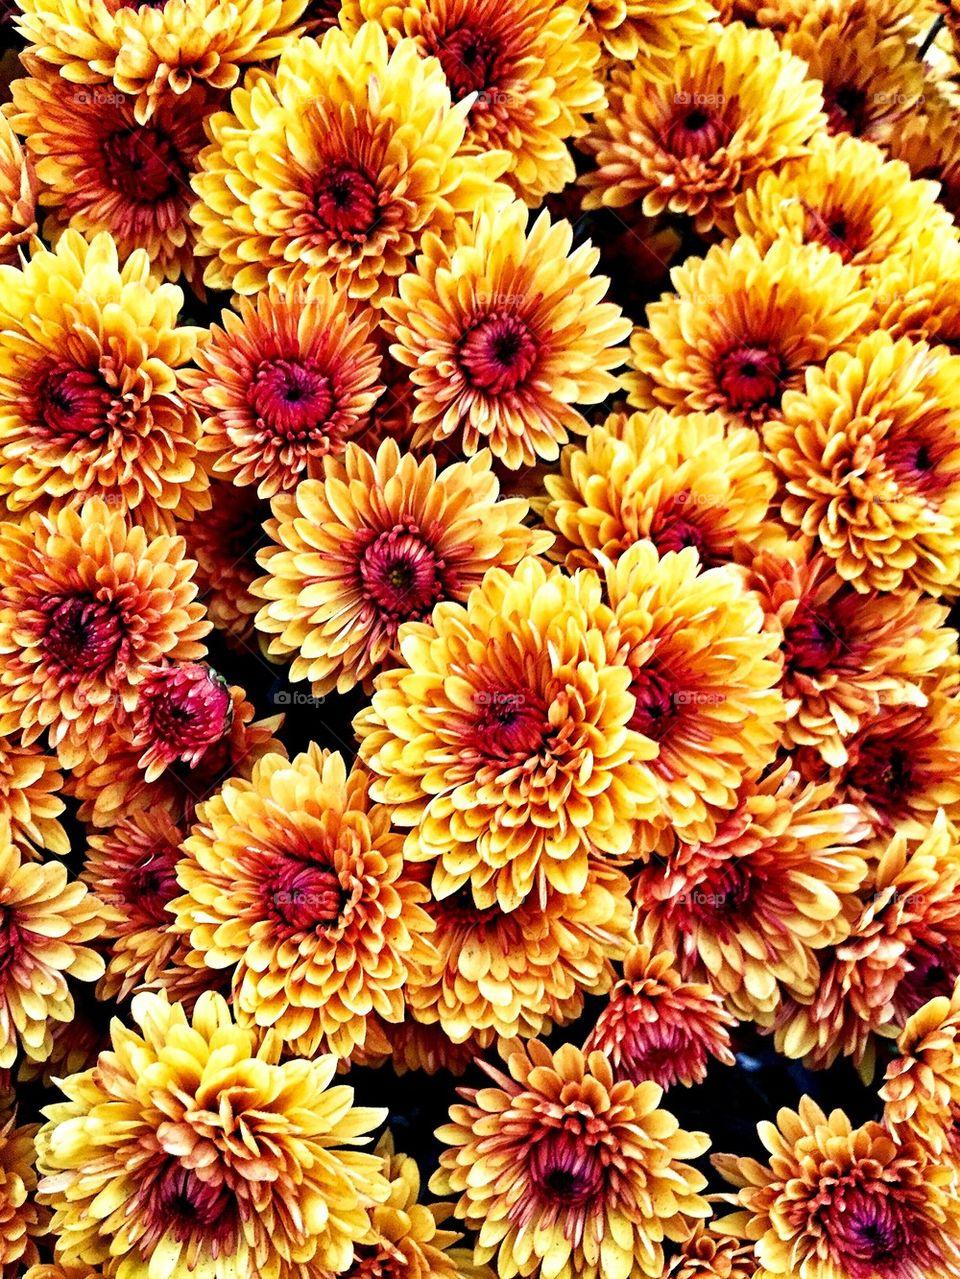 Full frame shot of chrysanthemum